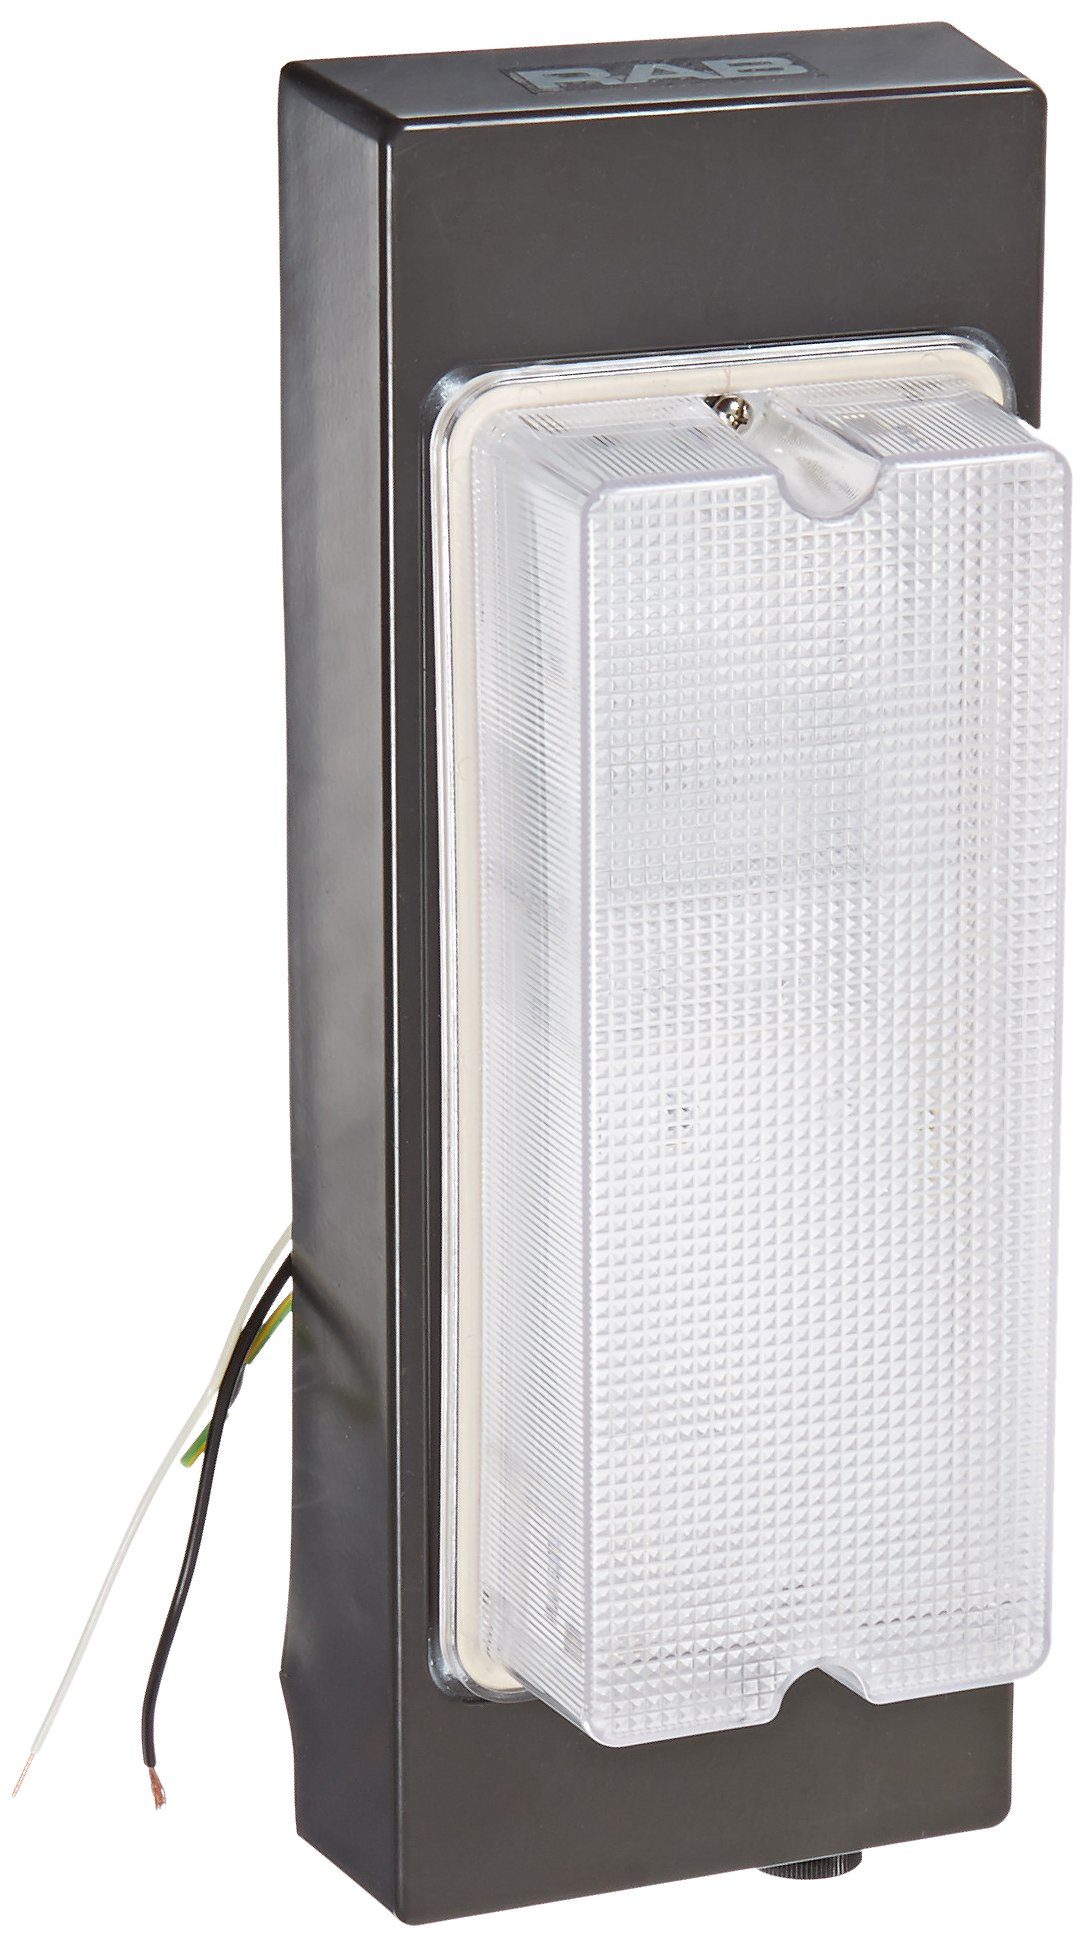 RAB Lighting VAN6F26/PC Vandalproof Van6 Compact Fluorescent Lamp, Twin Type, Aluminum, 26W Power, 1800 Lumens, 120V Button Photocell, Bronze Color